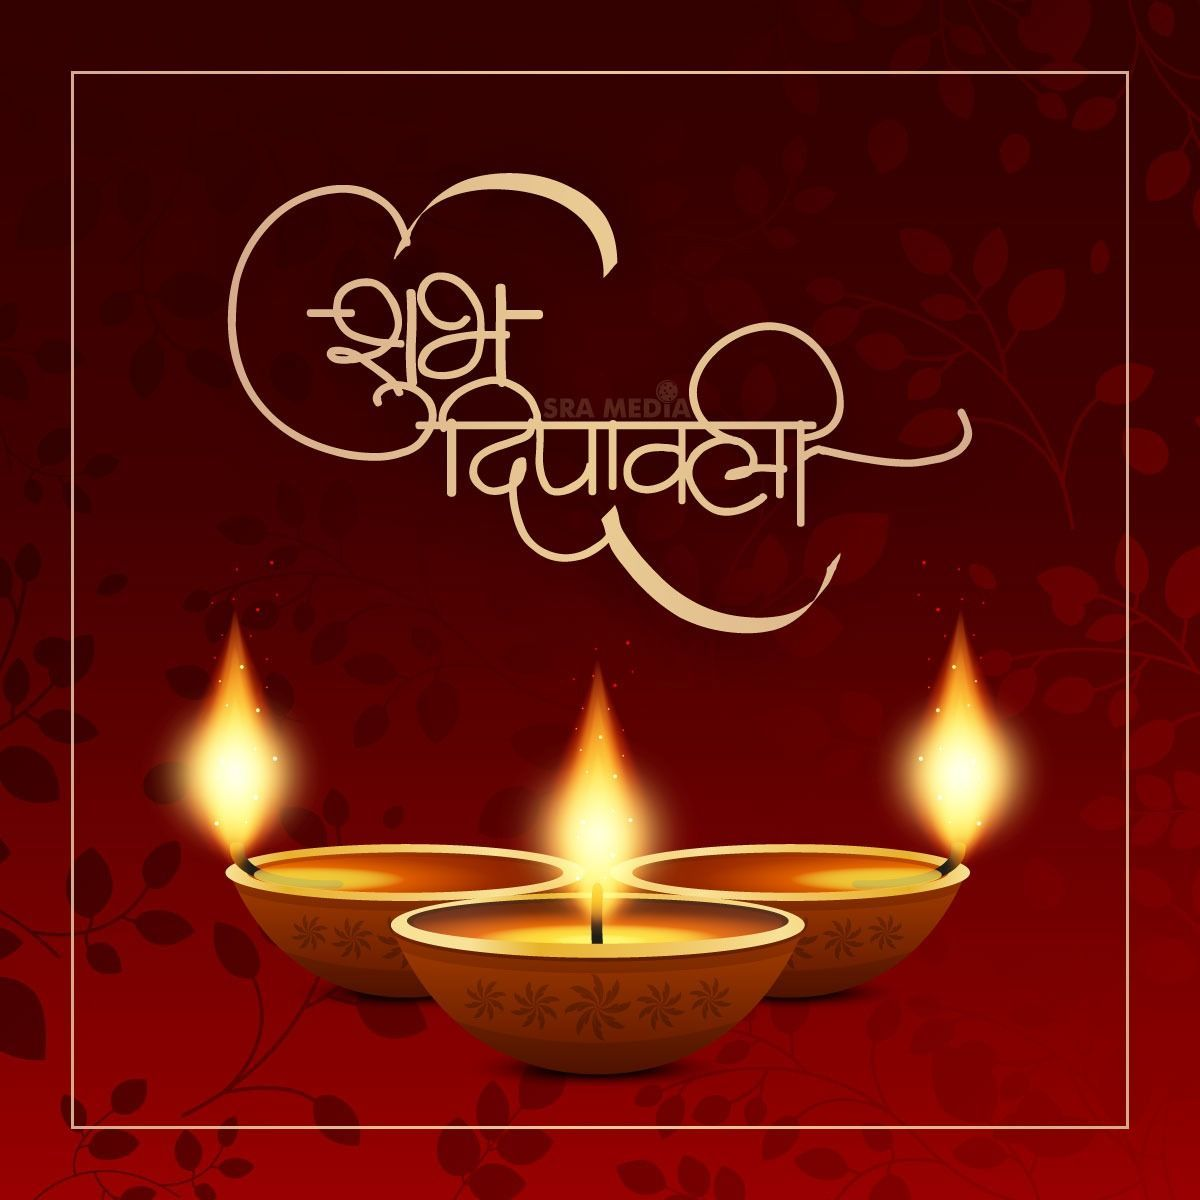 homedecor indian #home #decor #homedecor #diwali #india #happydiwali #love #festival #photography #festive #bhfyp #diwalidecor #handmade #fashion #wedding #homedecor #celebration #navratri #art #bollywood #festivals #deepavali #karvachauth #indian #style #mumbai #saree #sarees #diwalispecial #indianfestivals #happy #diwaligifts #navratriwishes